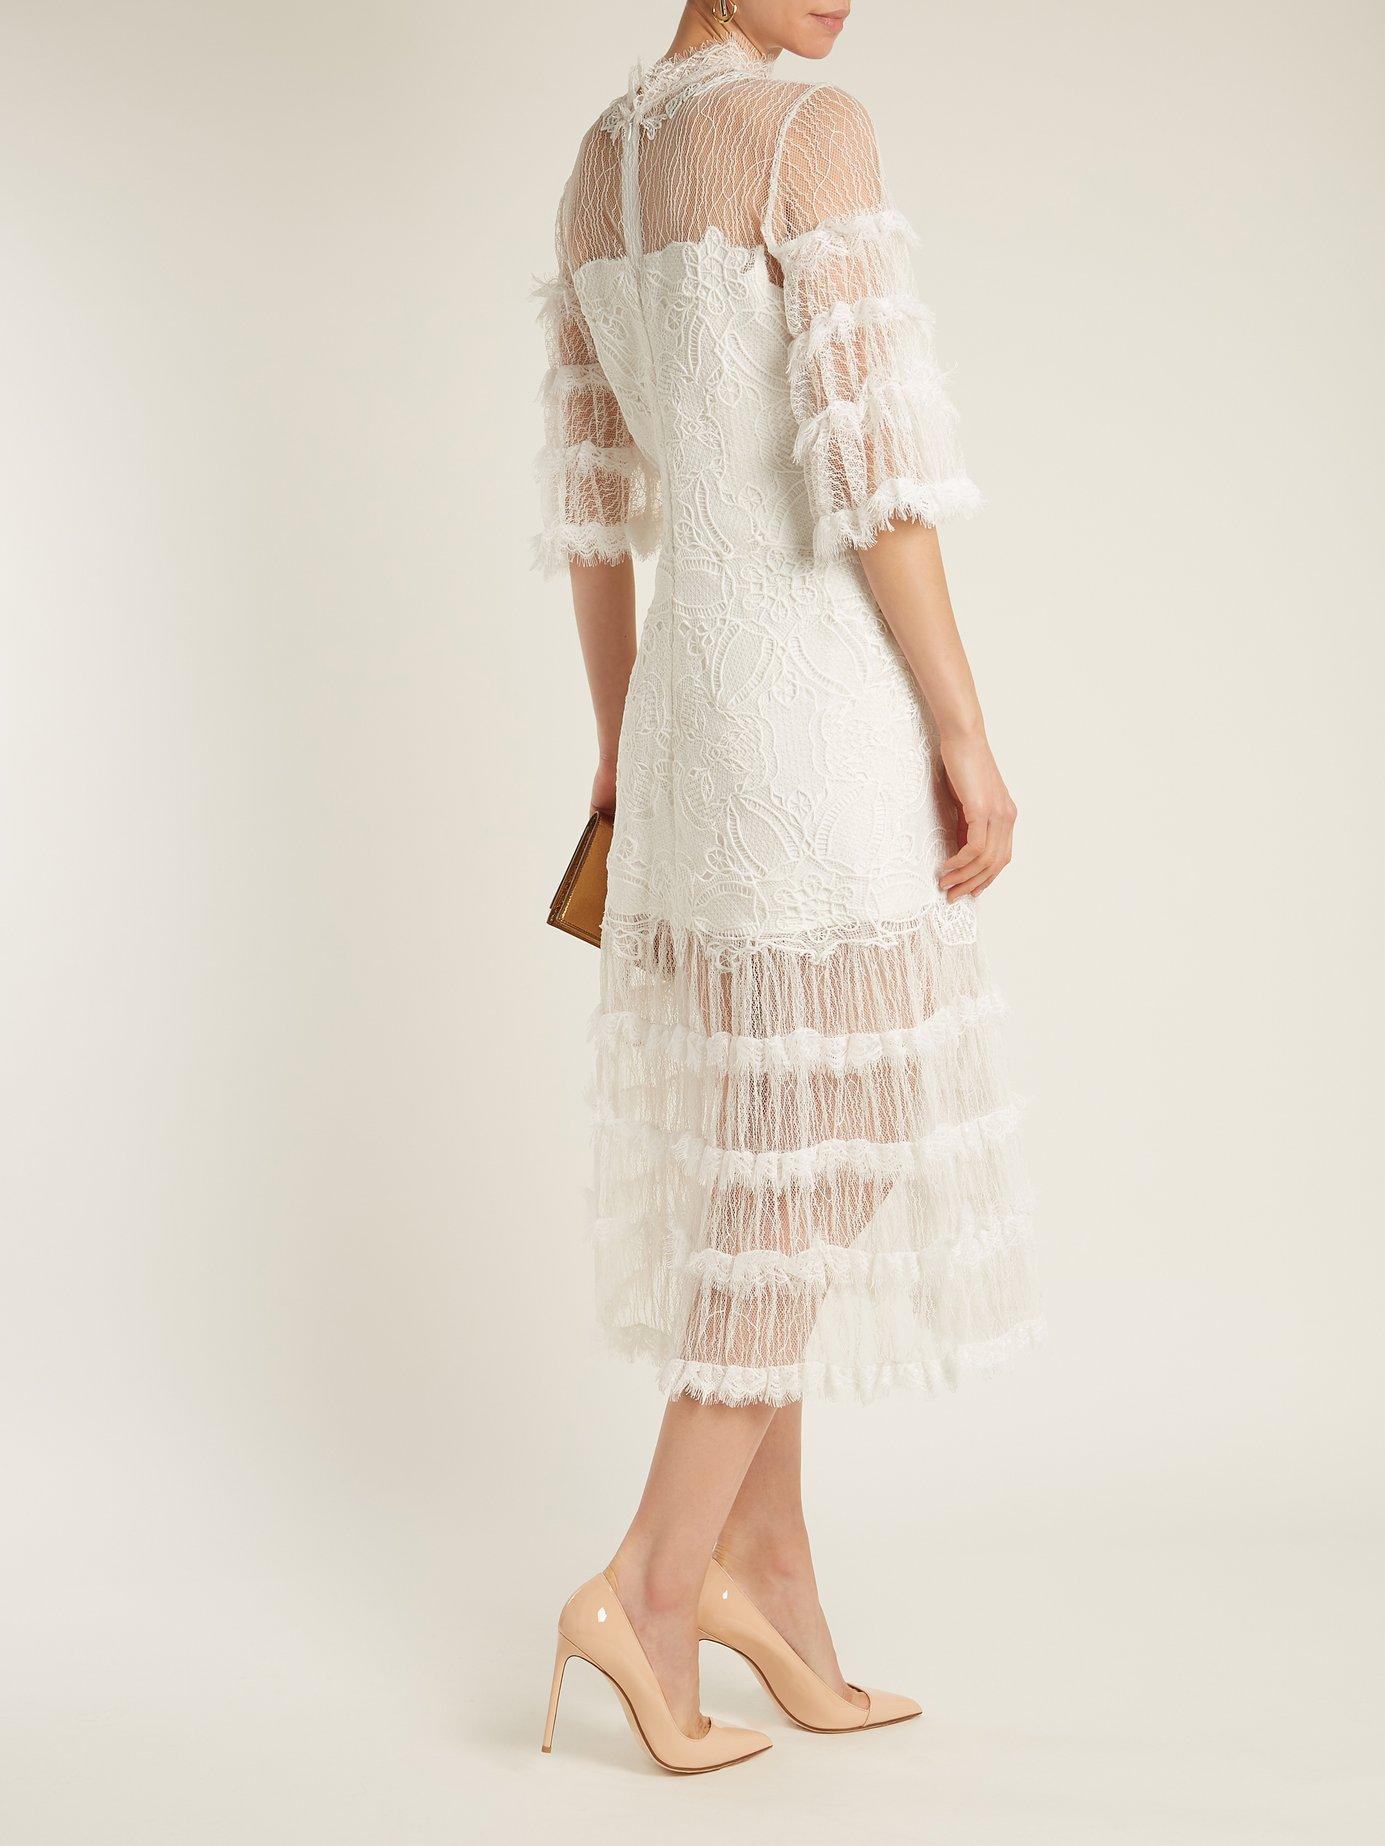 Contrast-panel tiered lace dress by Jonathan Simkhai